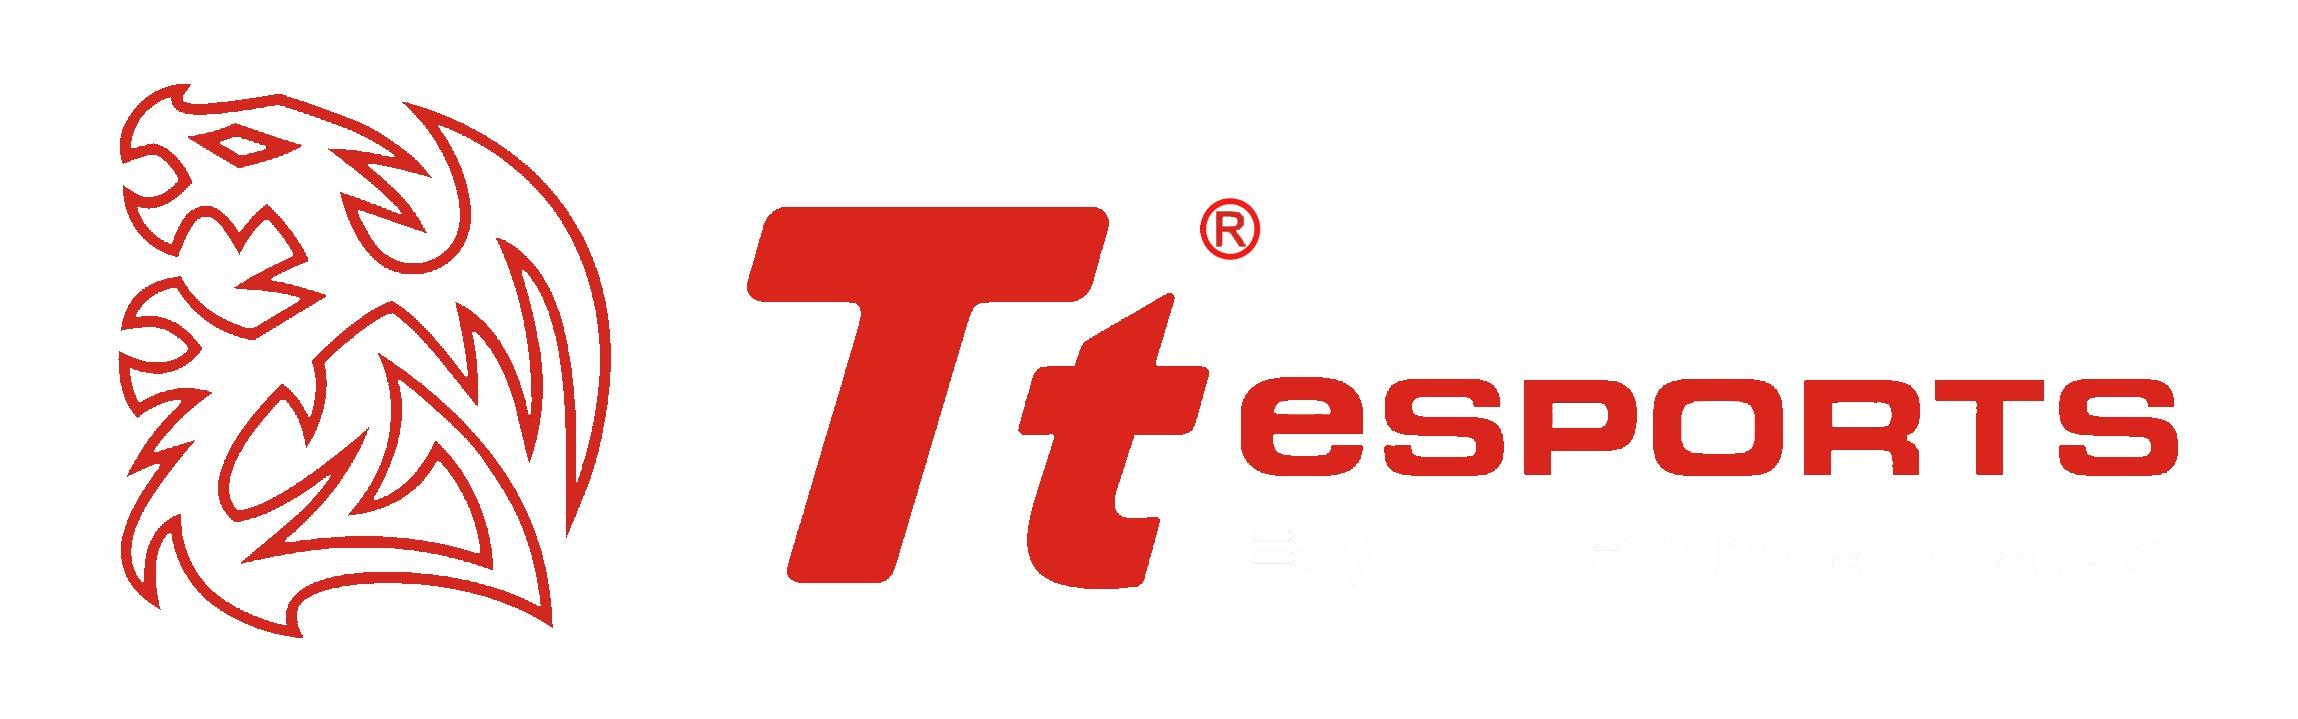 TteSPORTS